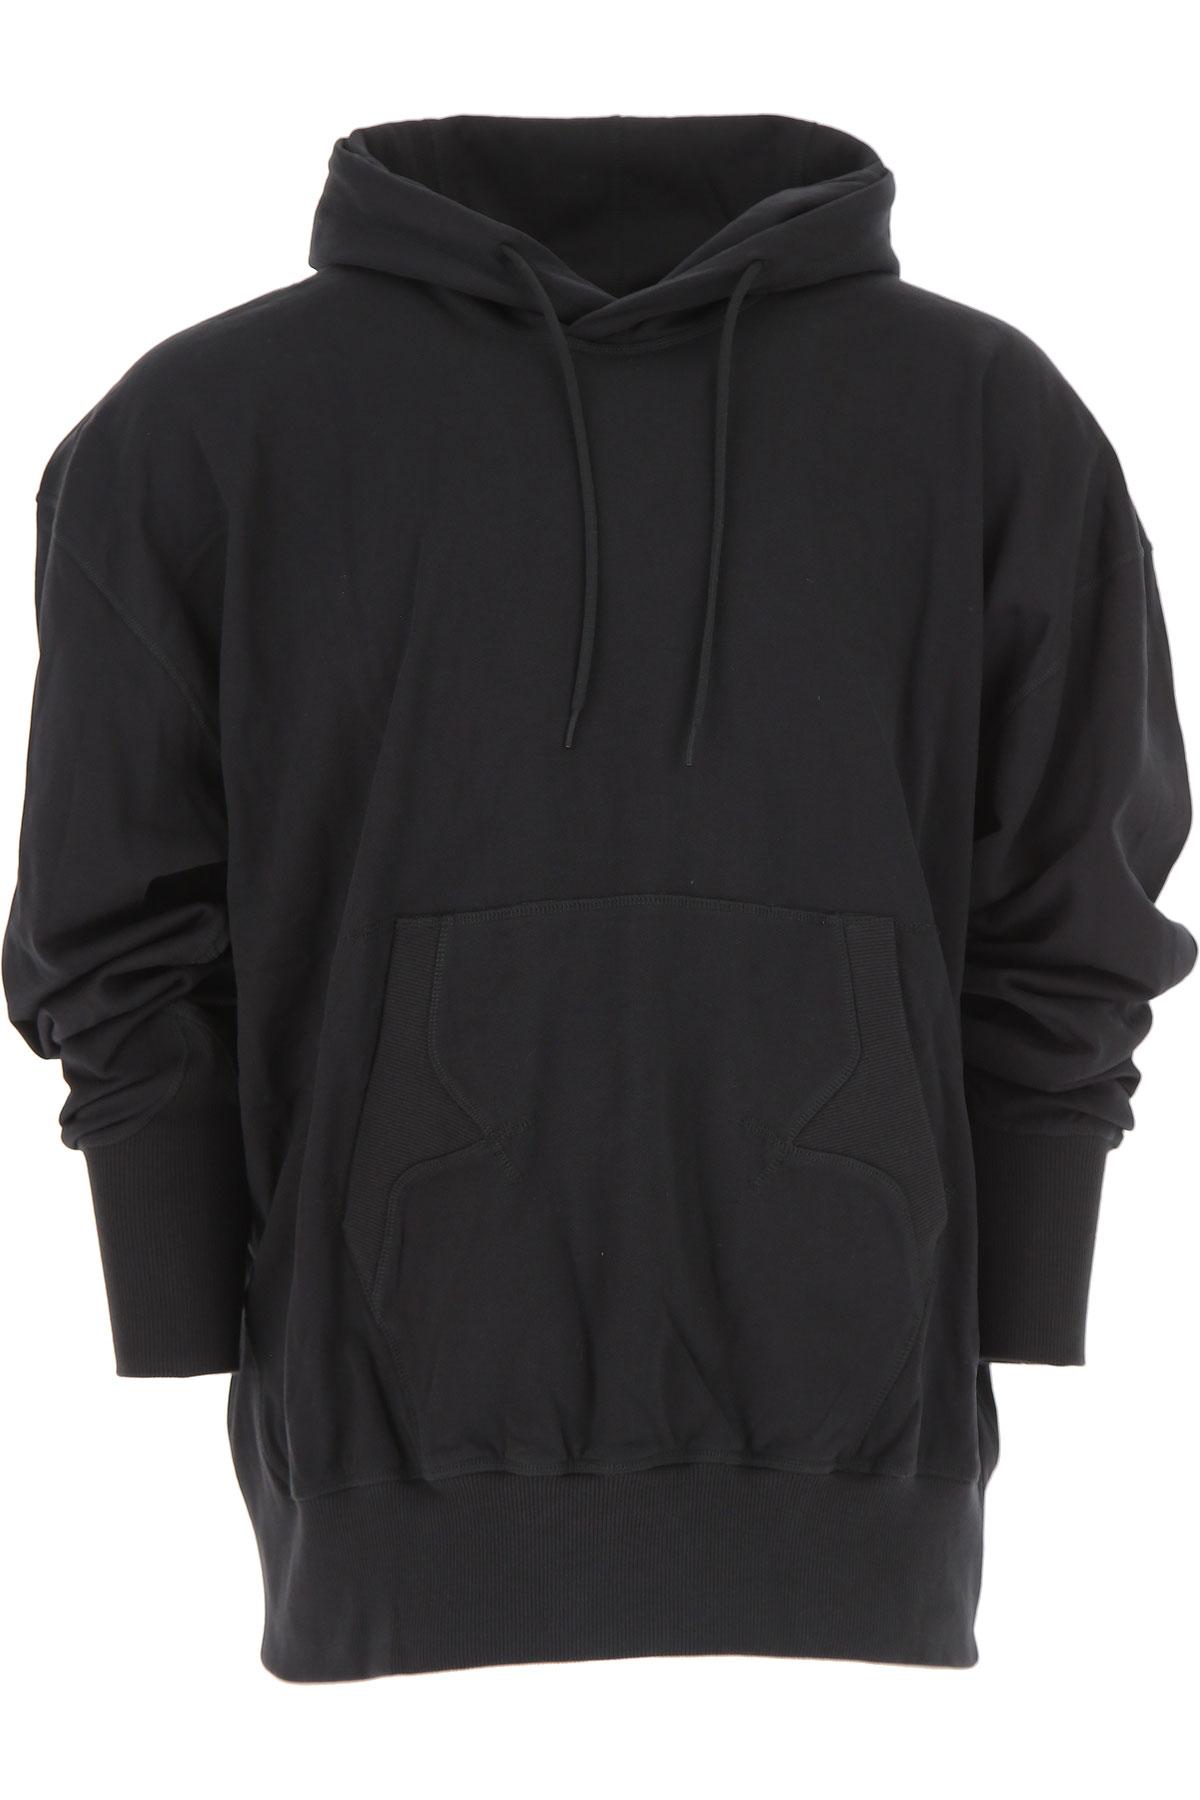 Adidas Sweatshirt for Men, Y3 Yohji Yamamoto, Black, Cotton, 2017, L S XL XS USA-476407